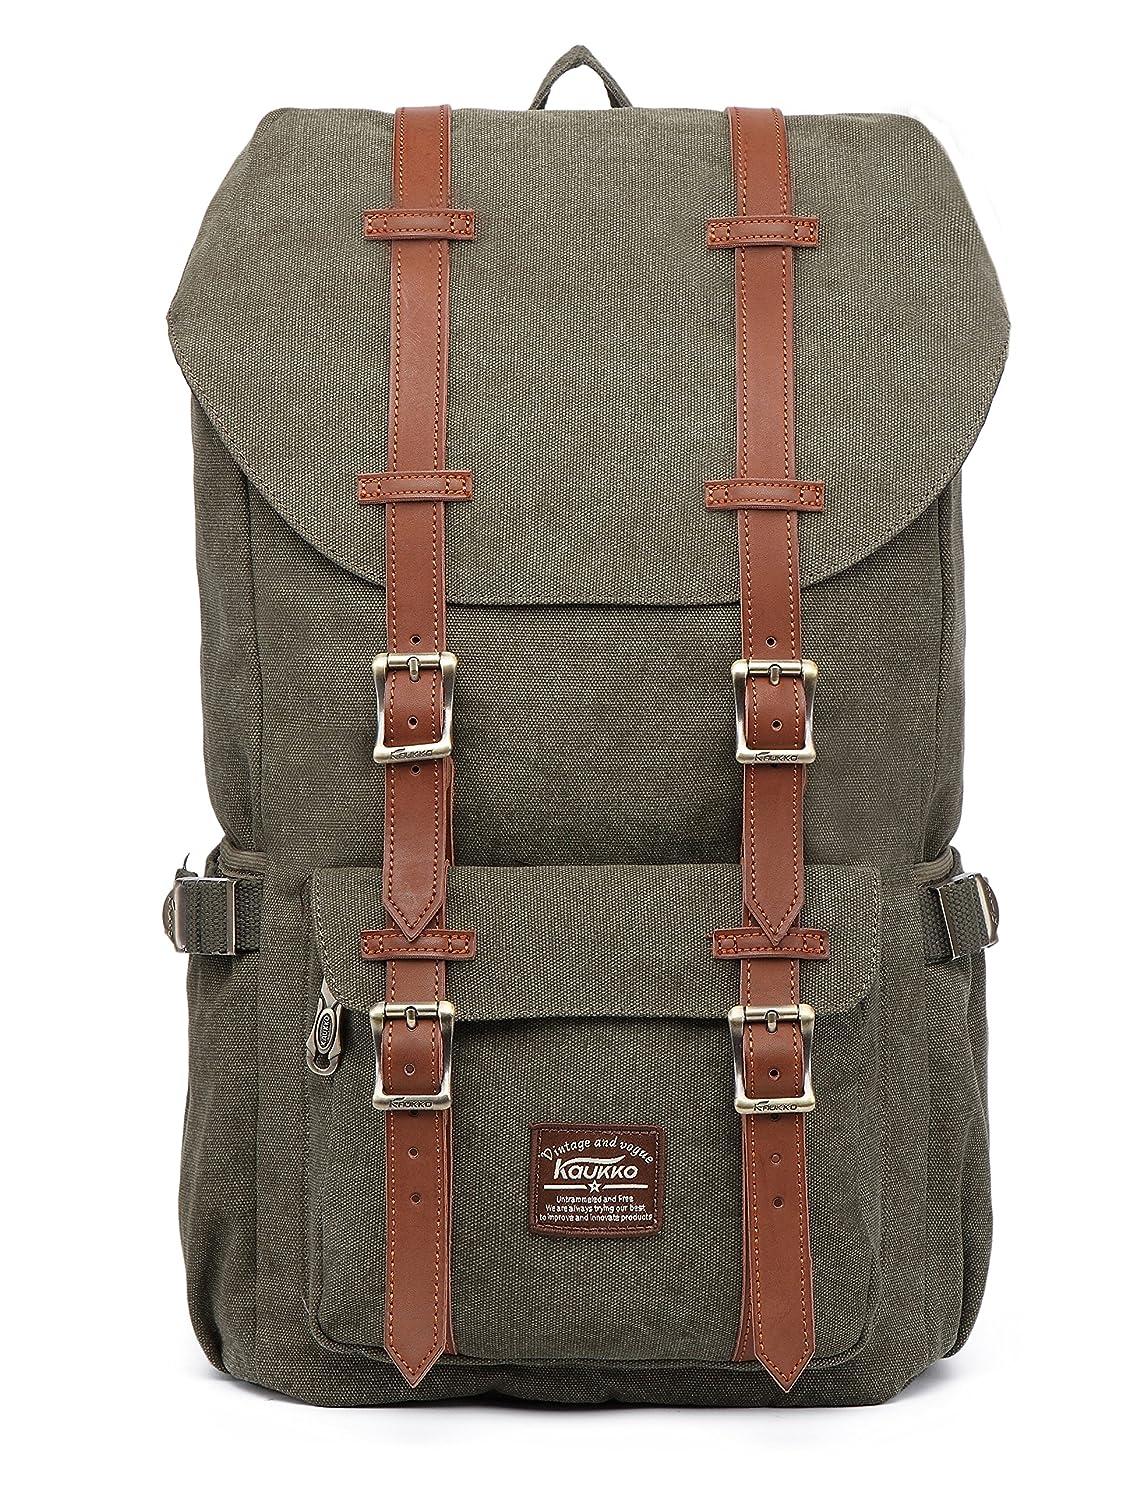 KAUKKO Laptop Outdoor Backpack, Travel Hiking& Camping Rucksack Pack, Casual Large College School Daypack, Shoulder Book Bags Back Fits 15